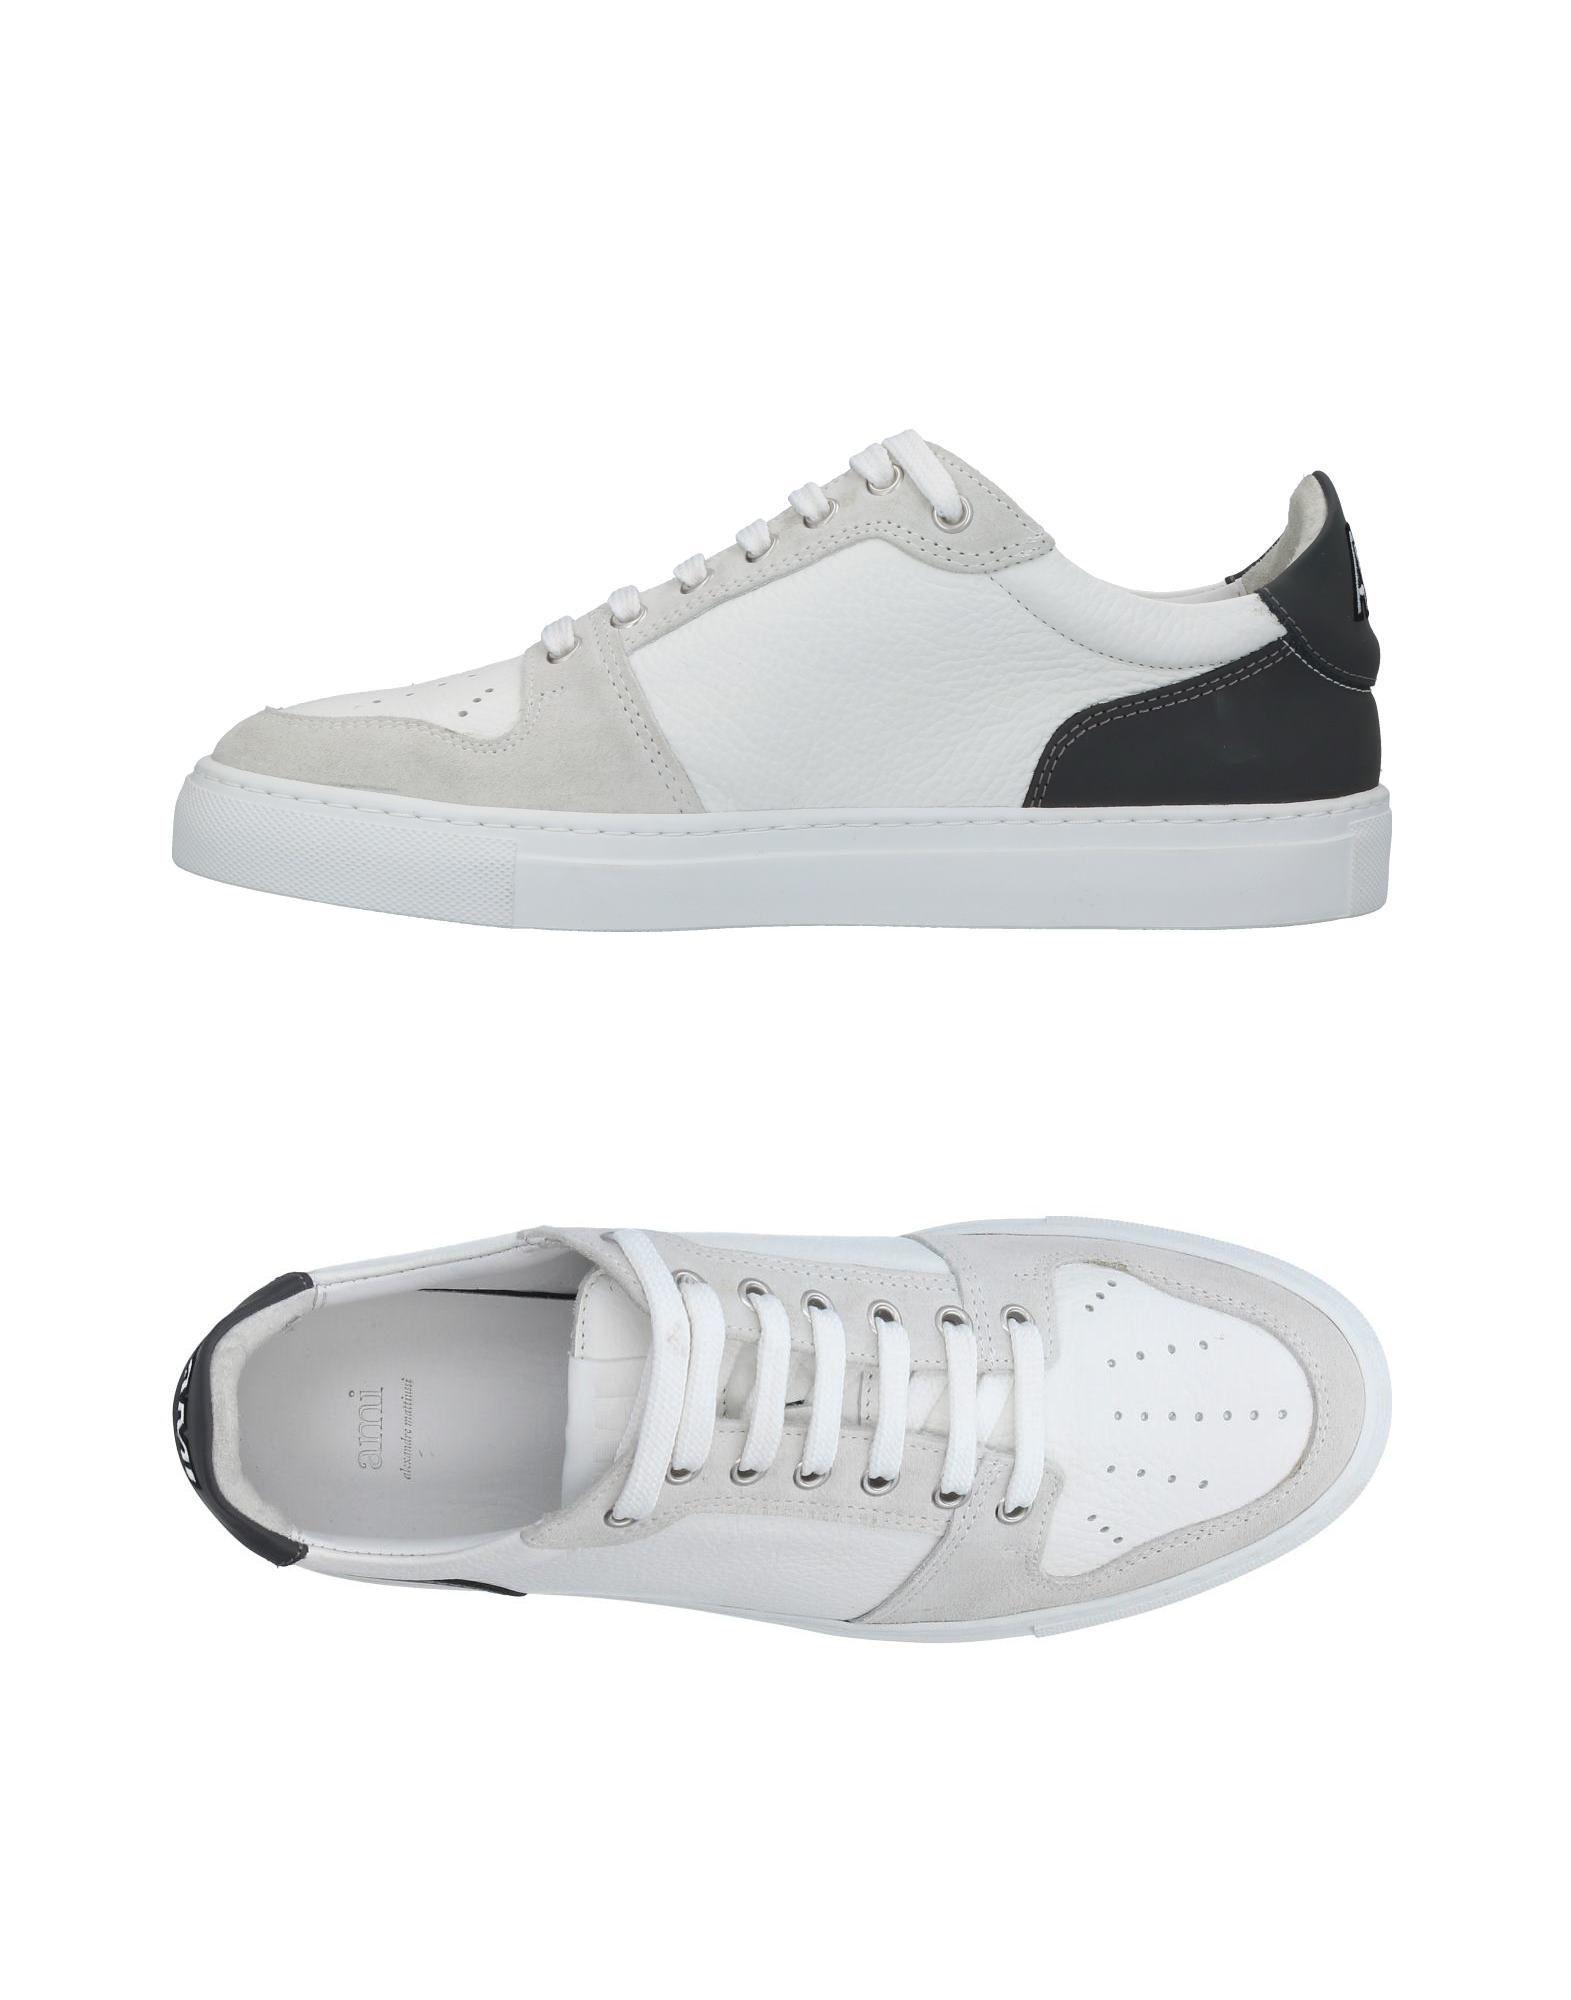 Ami Alexandre Mattiussi Sneakers Herren  11368368OS 11368368OS 11368368OS 348682